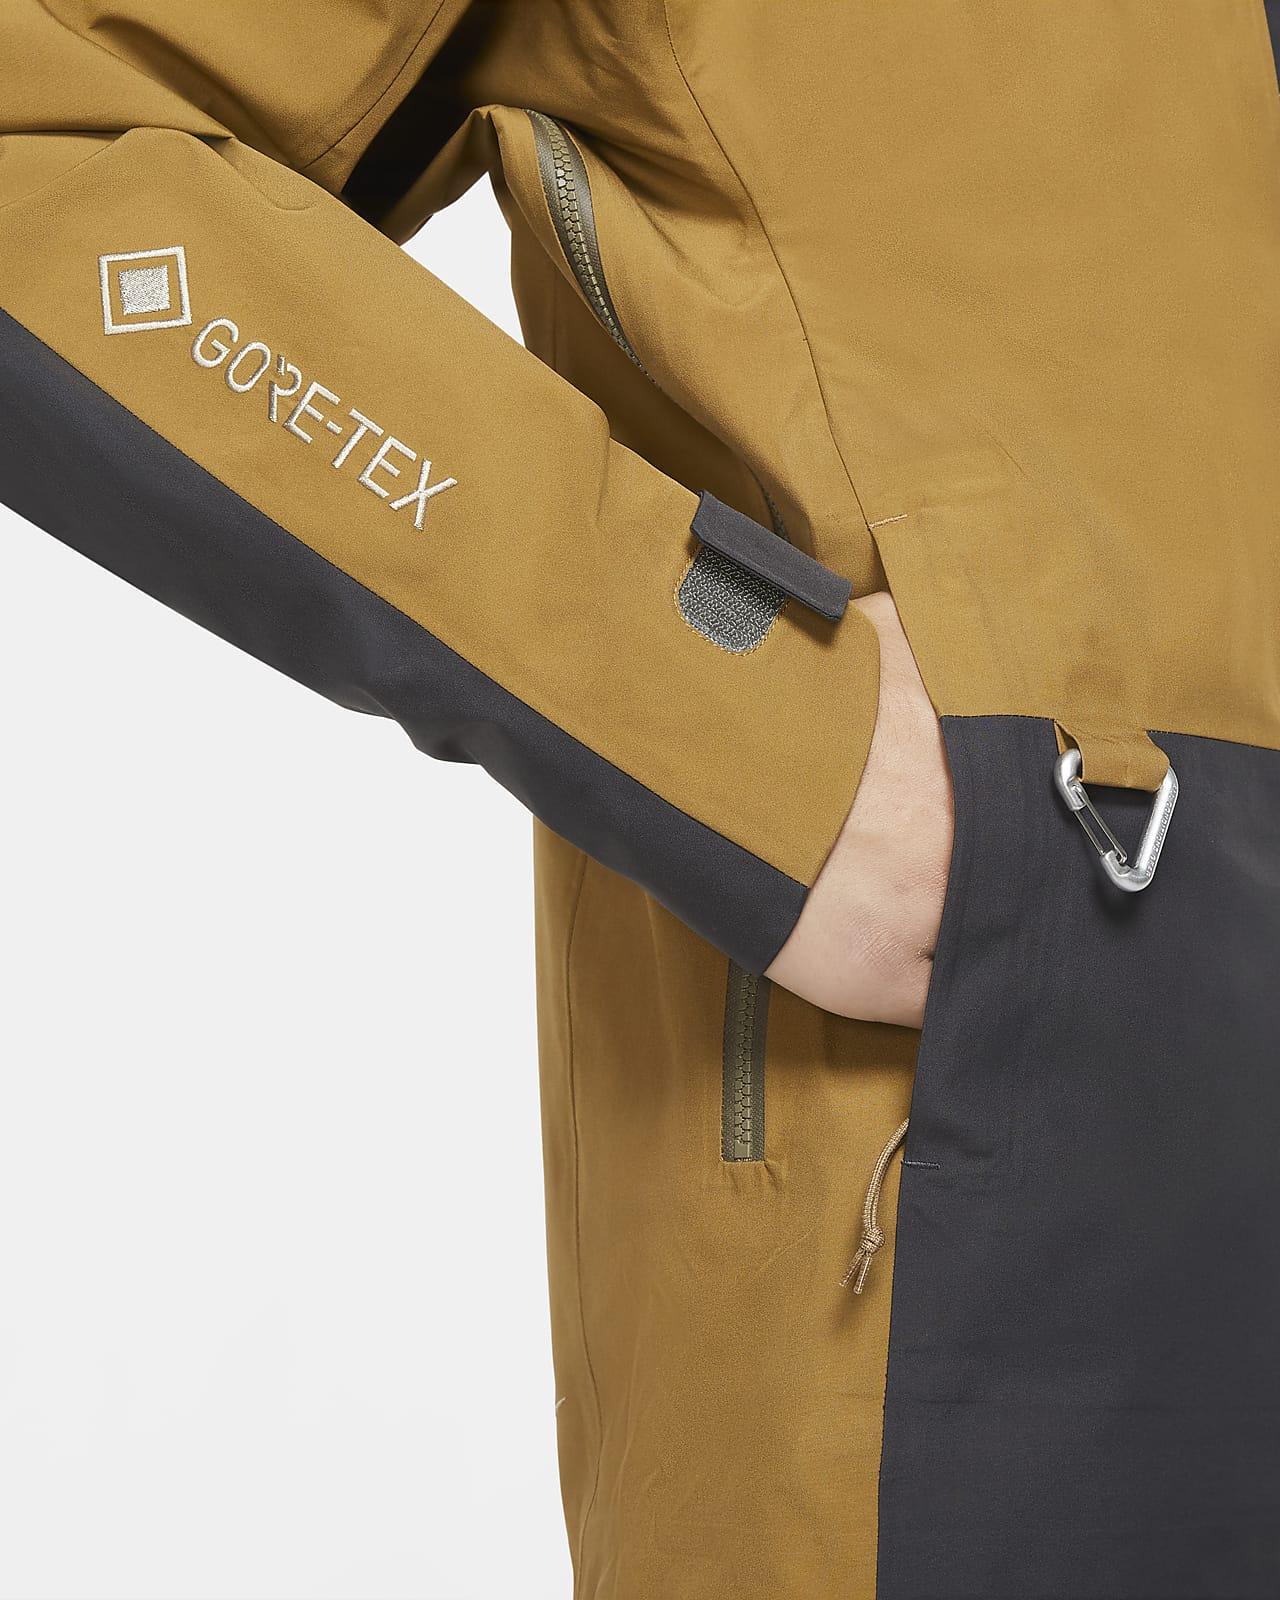 "Nike ACG GORE-TEX ""Misery Ridge"" Men's Jacket"